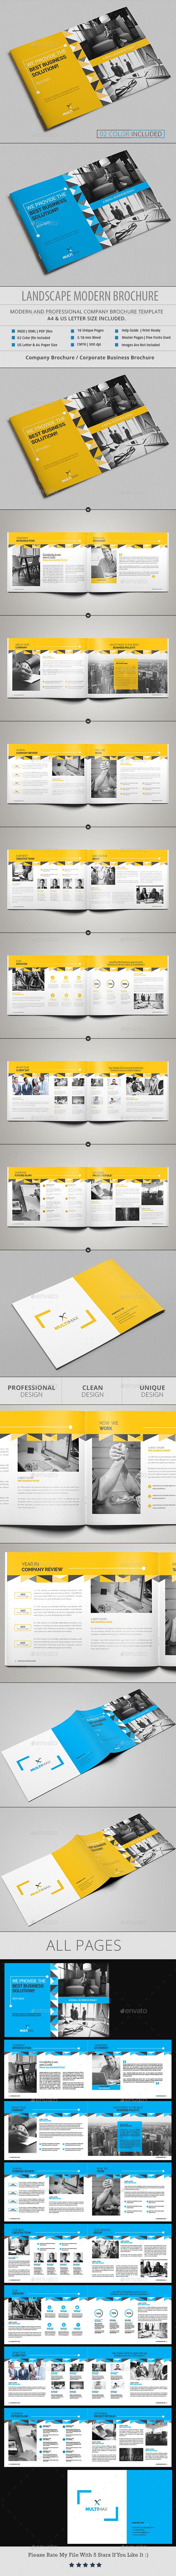 Landscape Modern Brochure - Brochures Print Templates